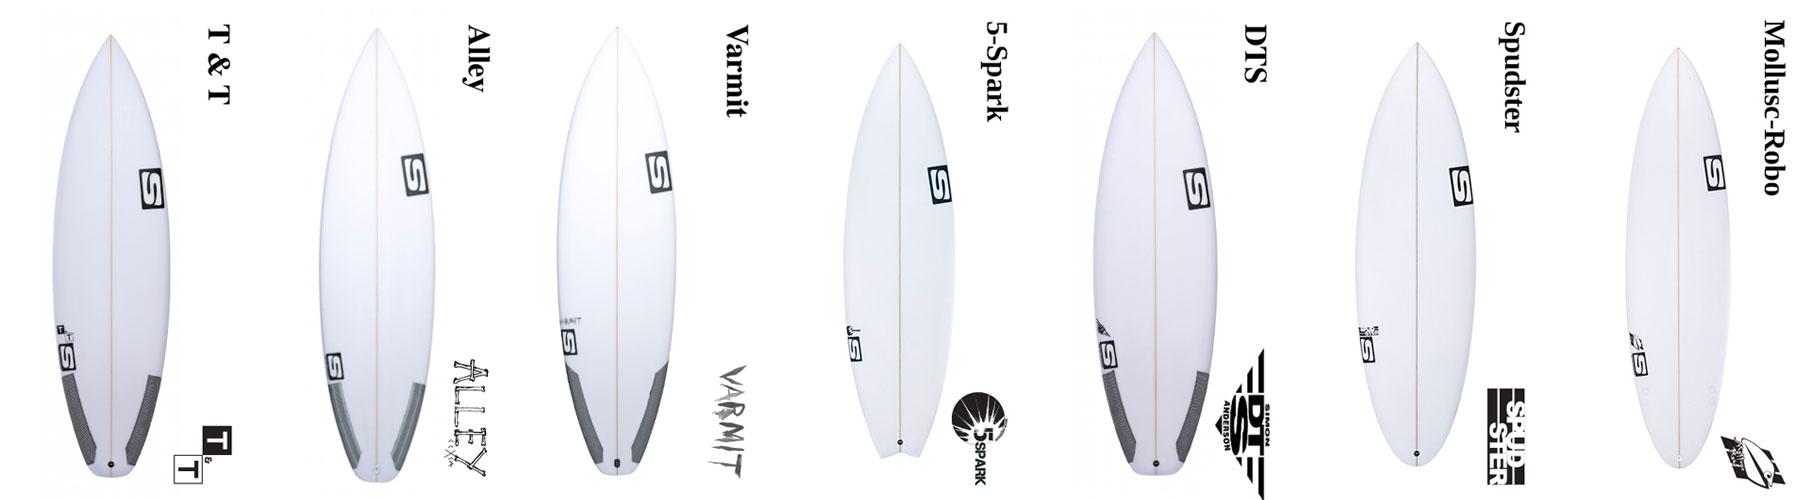 Simon anderson Custom Surfboards